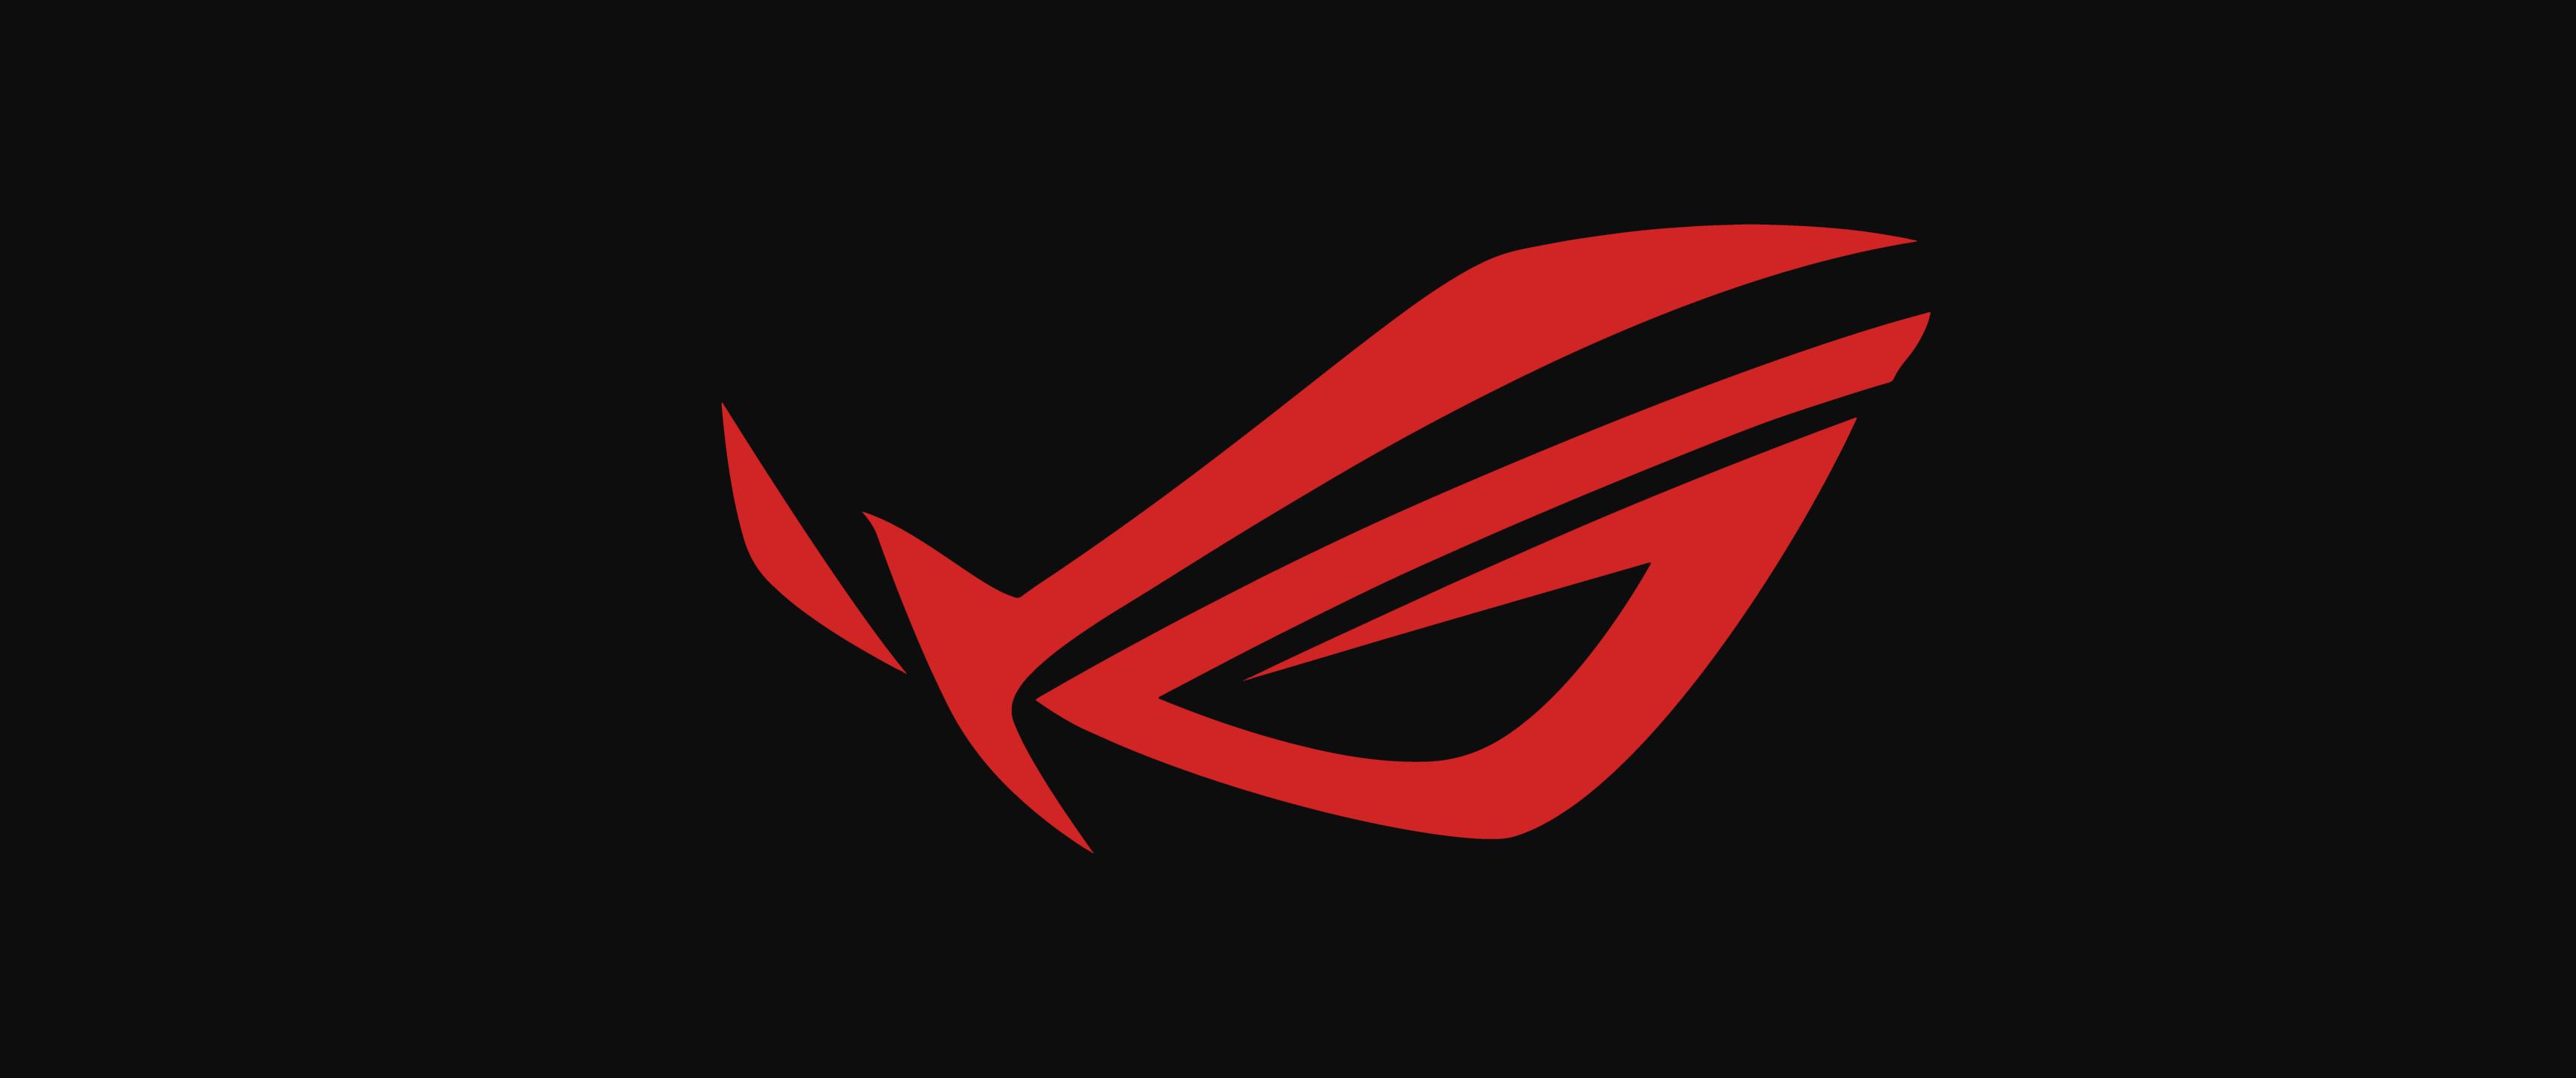 Minimalistic ASUS ROG logo.